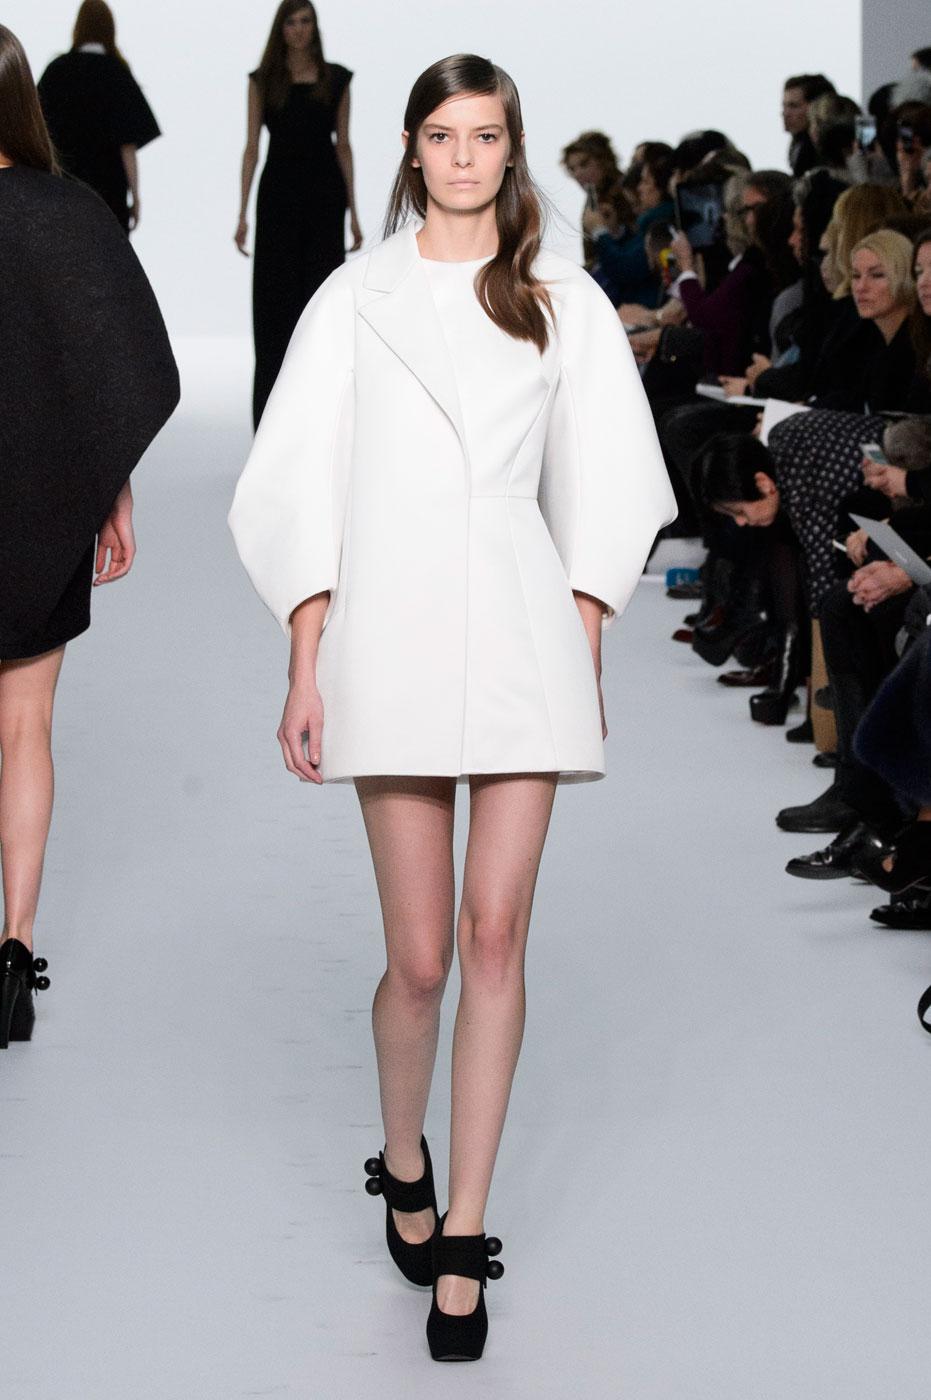 Kayek-fashion-runway-show-haute-couture-paris-spring-summer-2015-the-impression-11